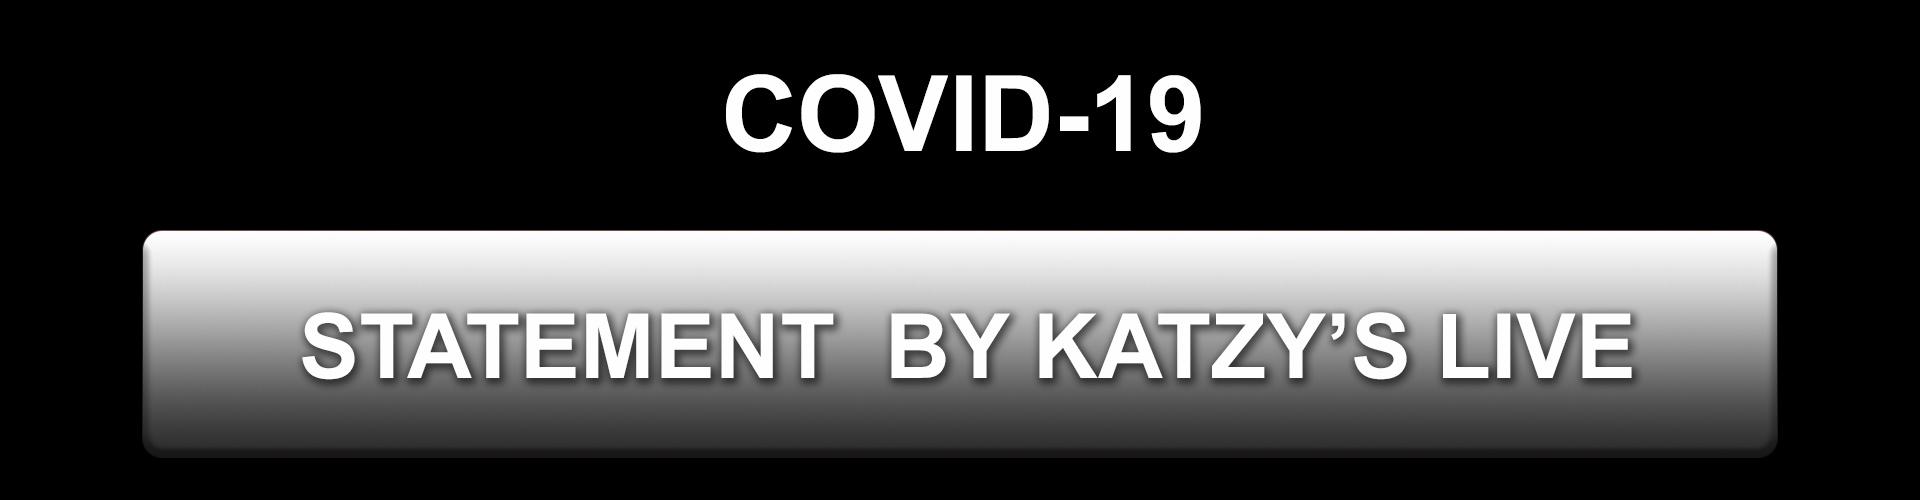 Covid-19 Statement - Katzy's Live